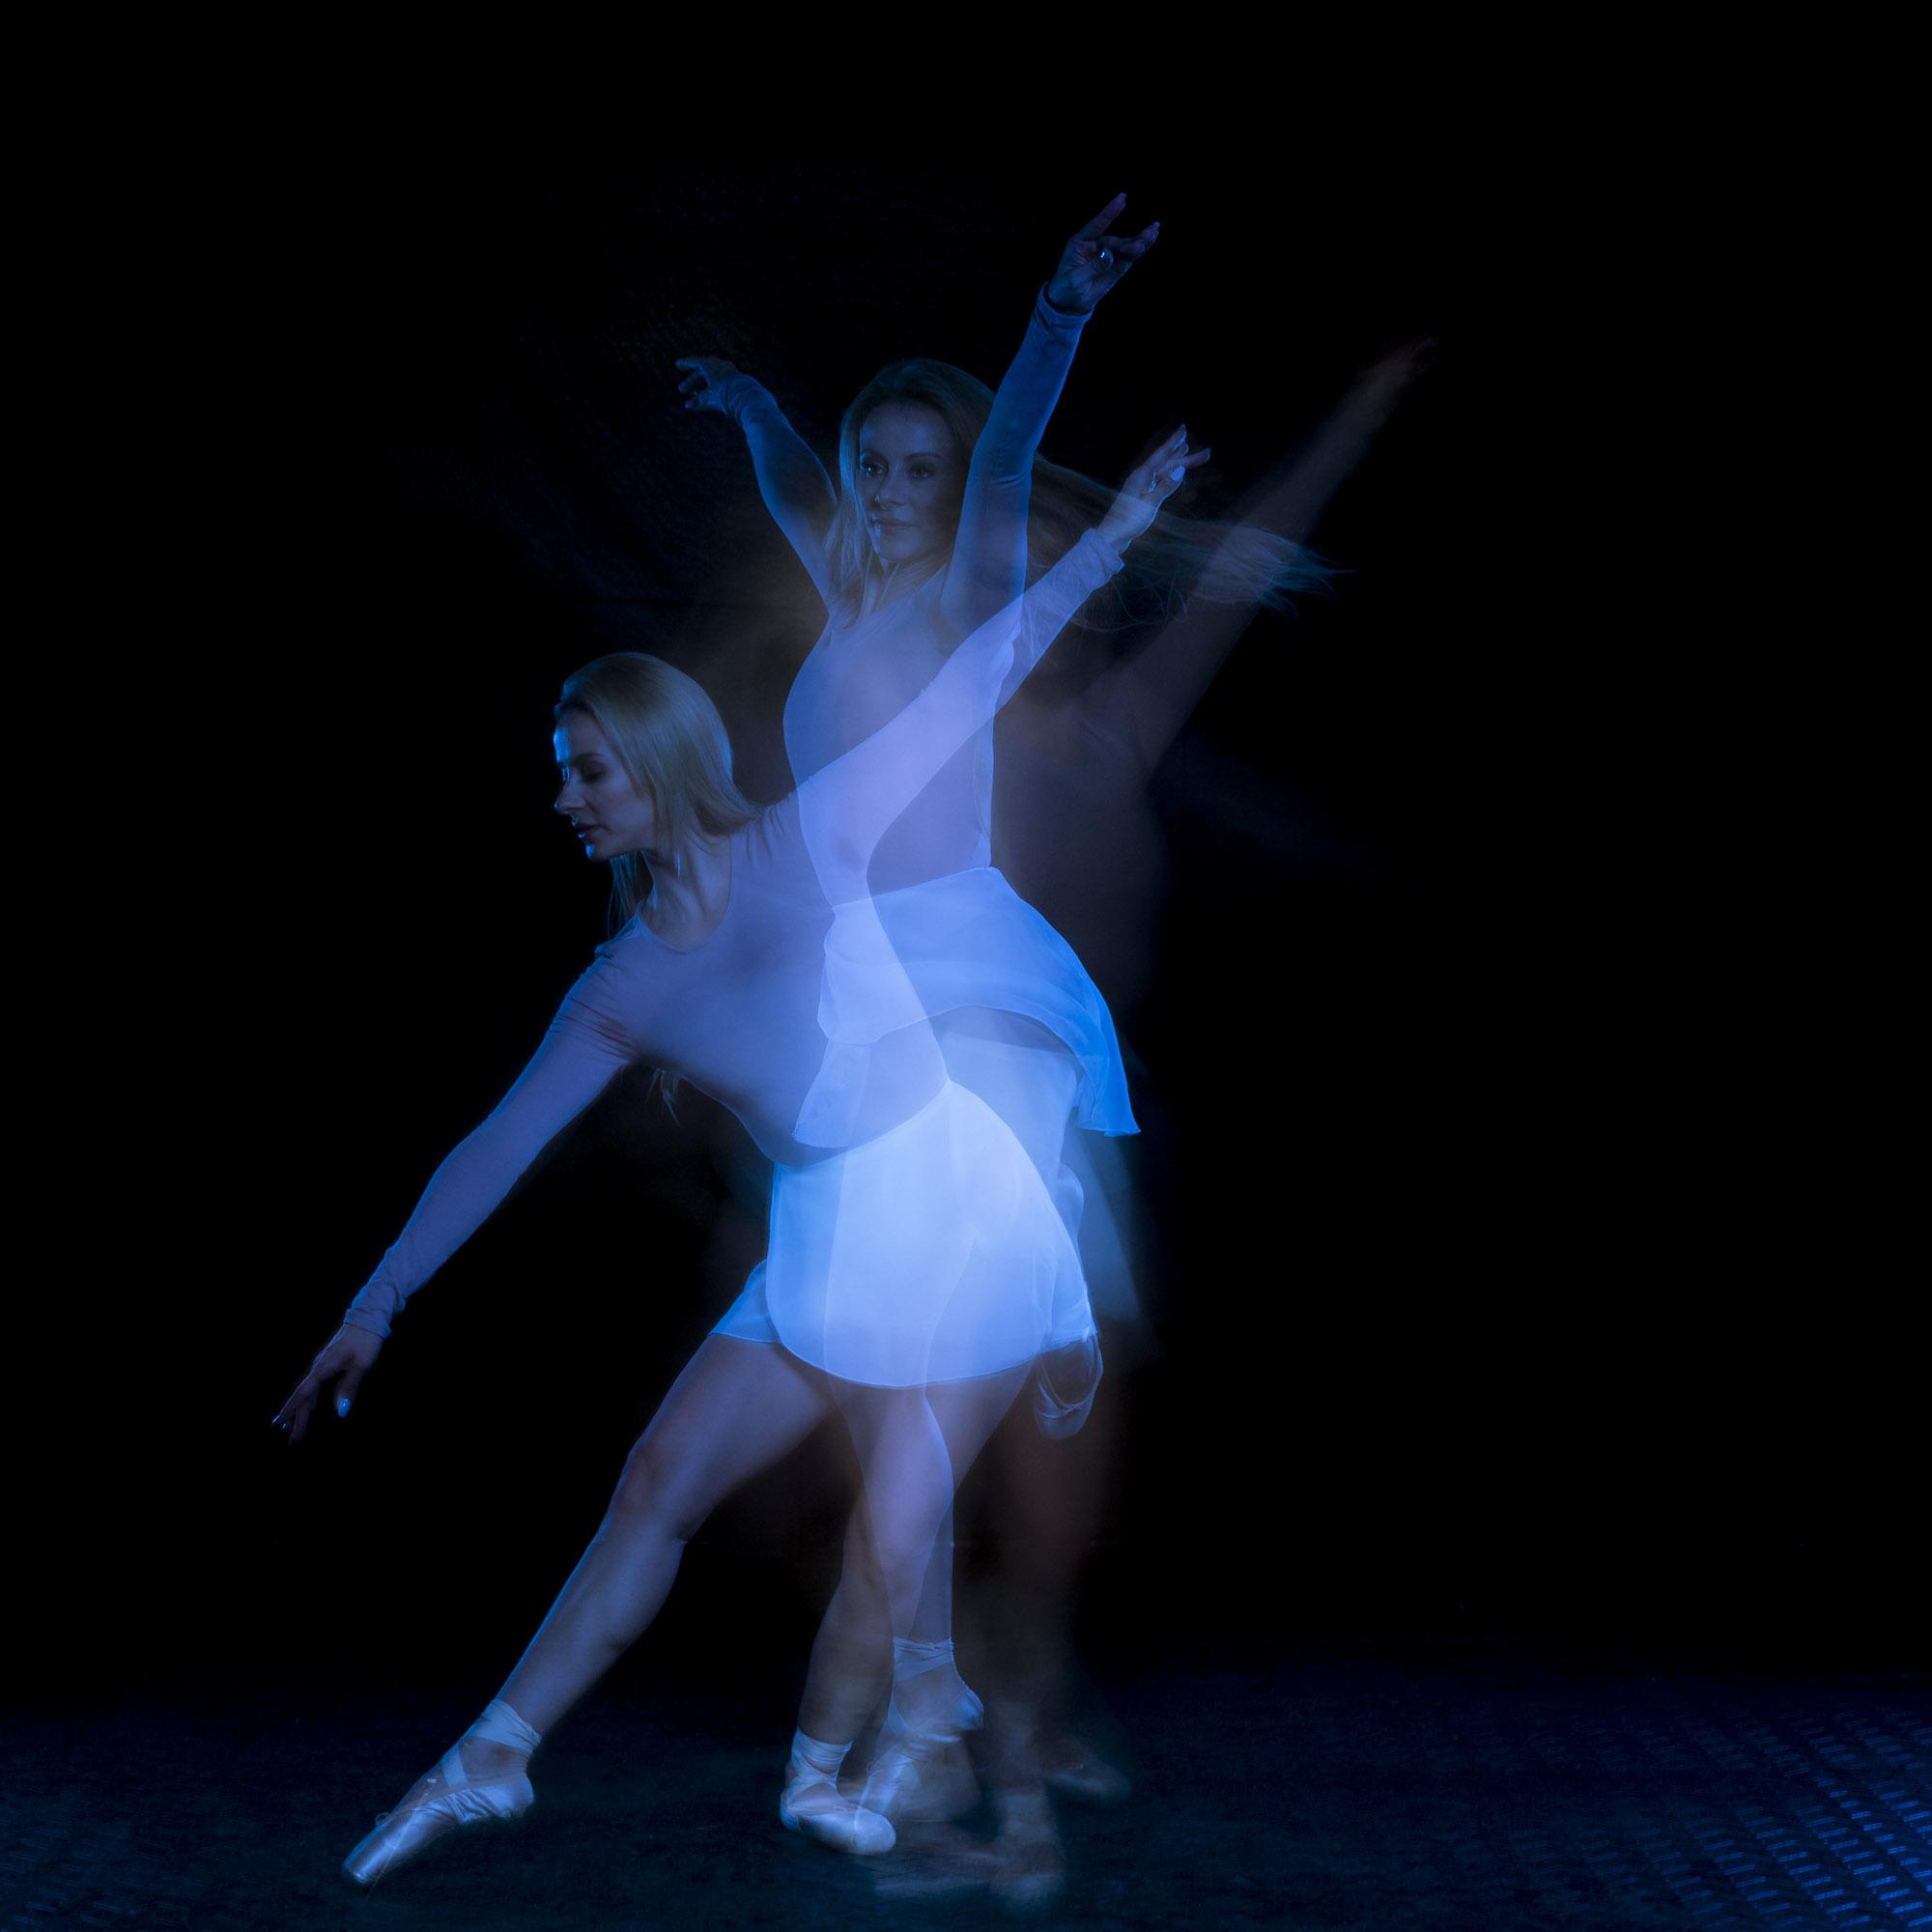 Multi dancer